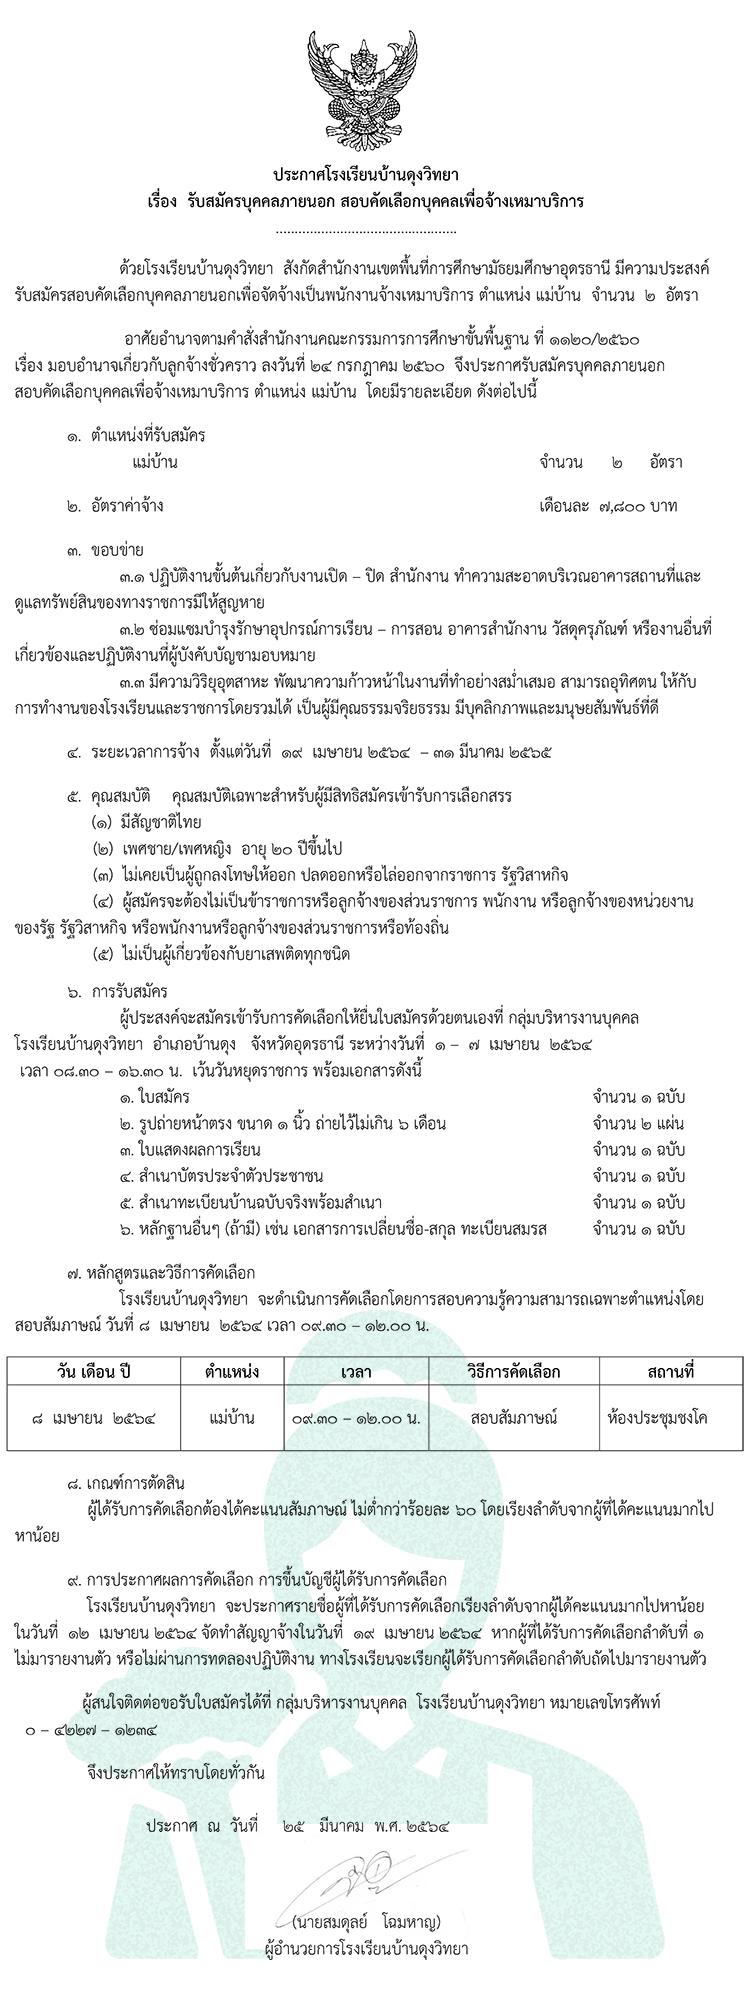 64-03-26-maid-750